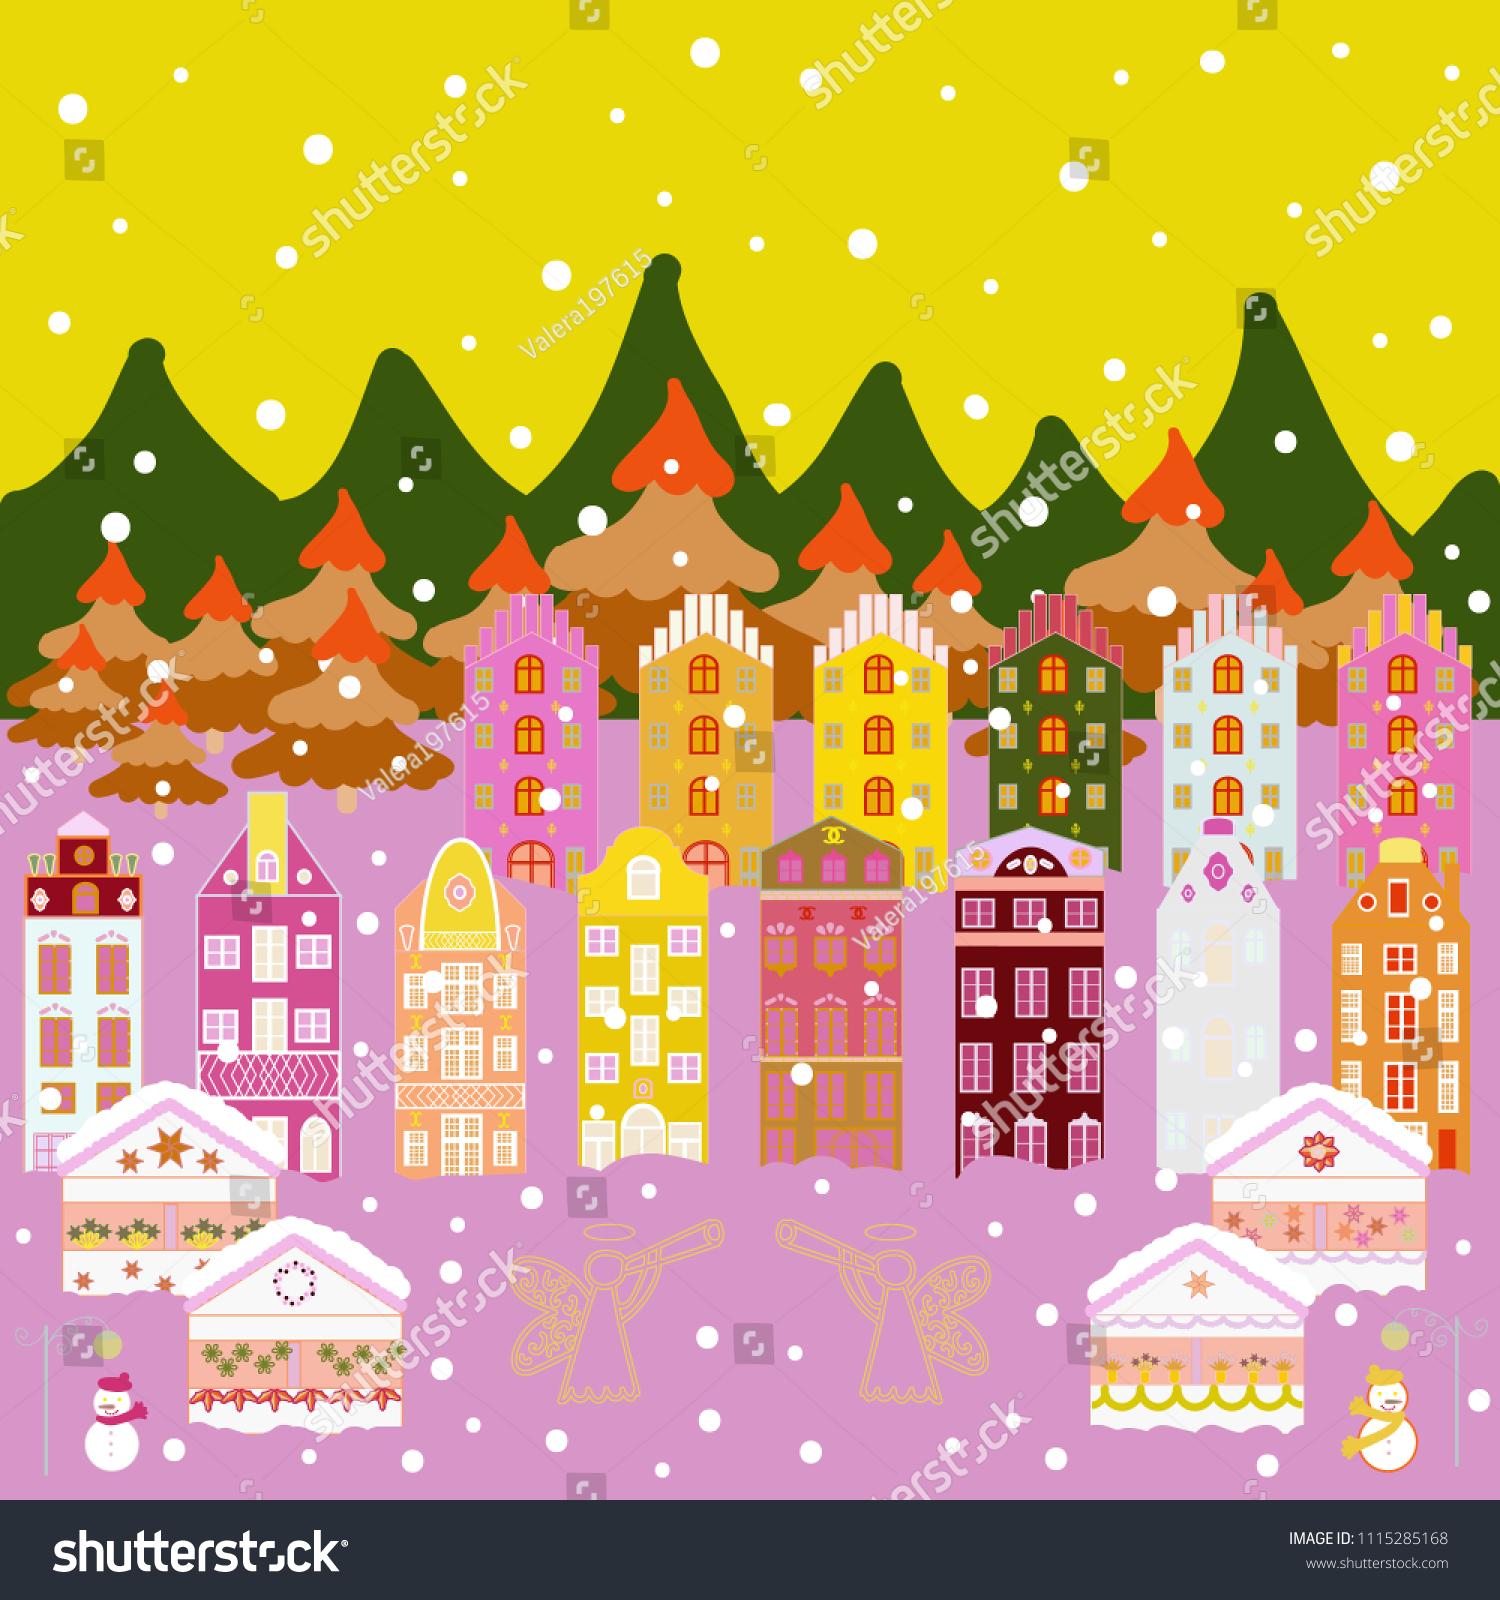 Paper Art Happy New Year House Stock Vector 1115285168 - Shutterstock